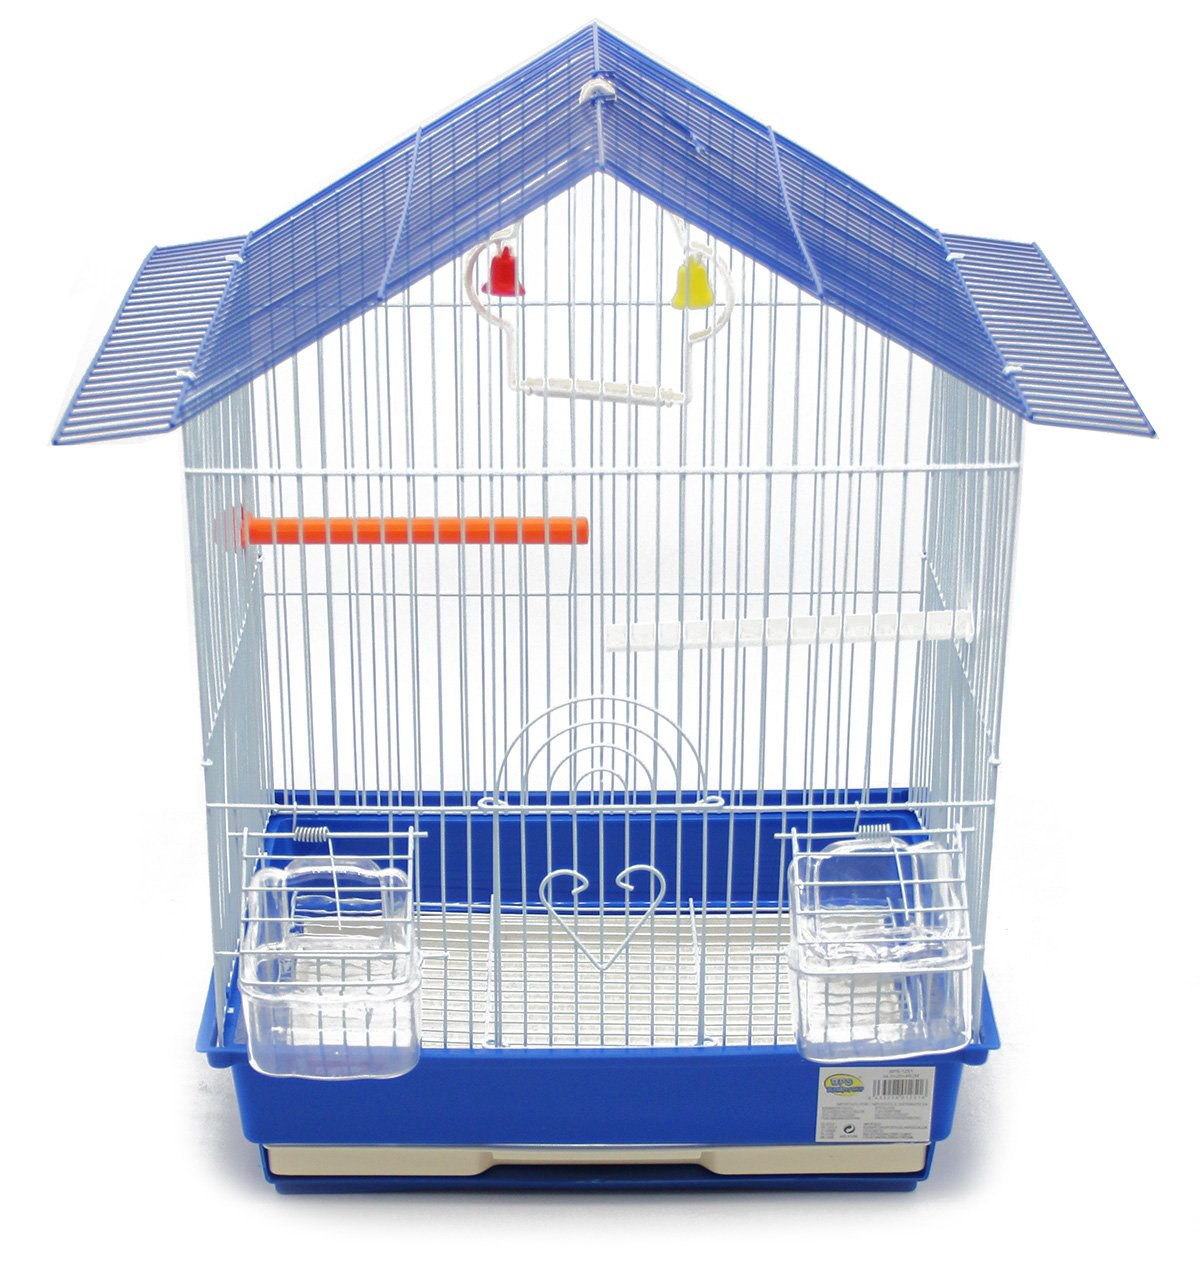 BPS Cage Bird Cage Metal avec Feeder Drinker Swing Jumper Color Bucket Envoyer au Hasard 46 x 28 x 34.5 cm BPS-1251 BPS(R)